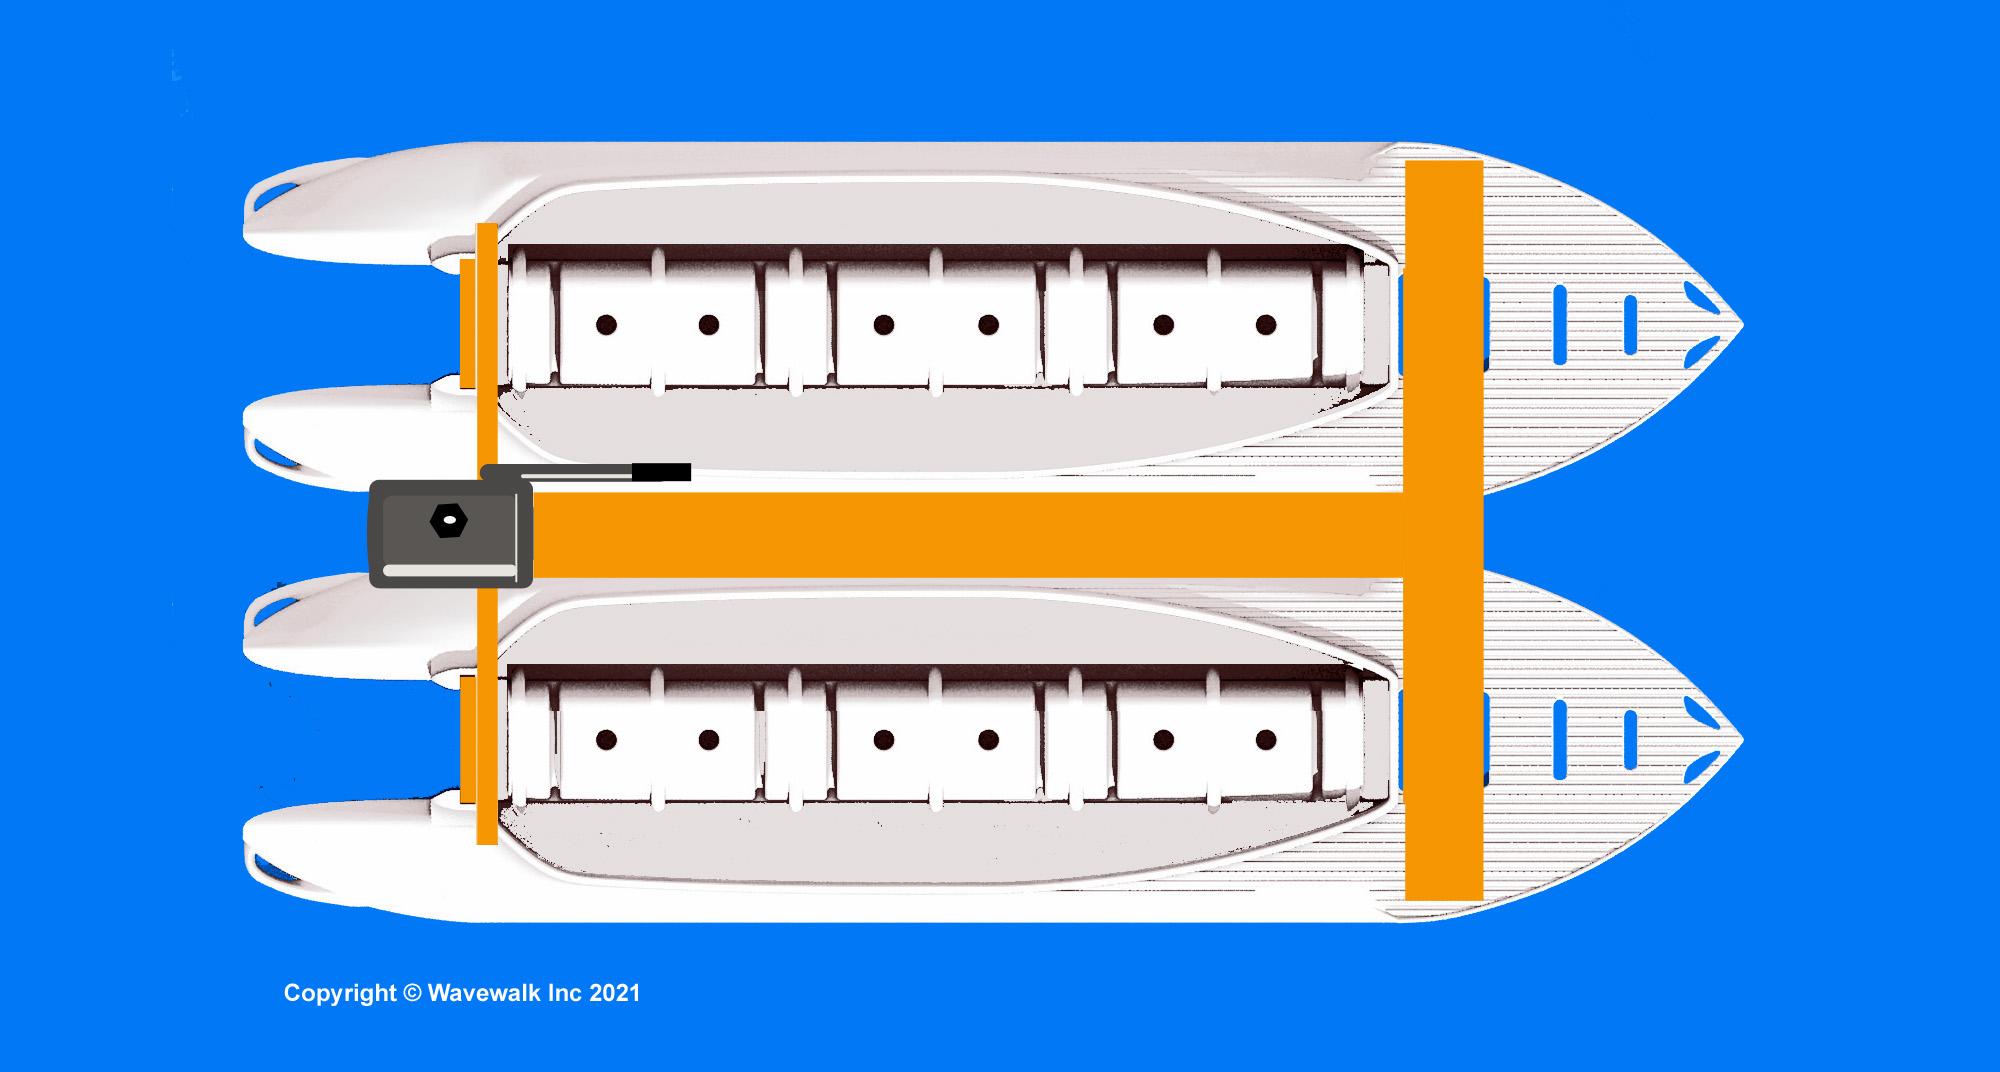 Twin S4 Multihull Boat